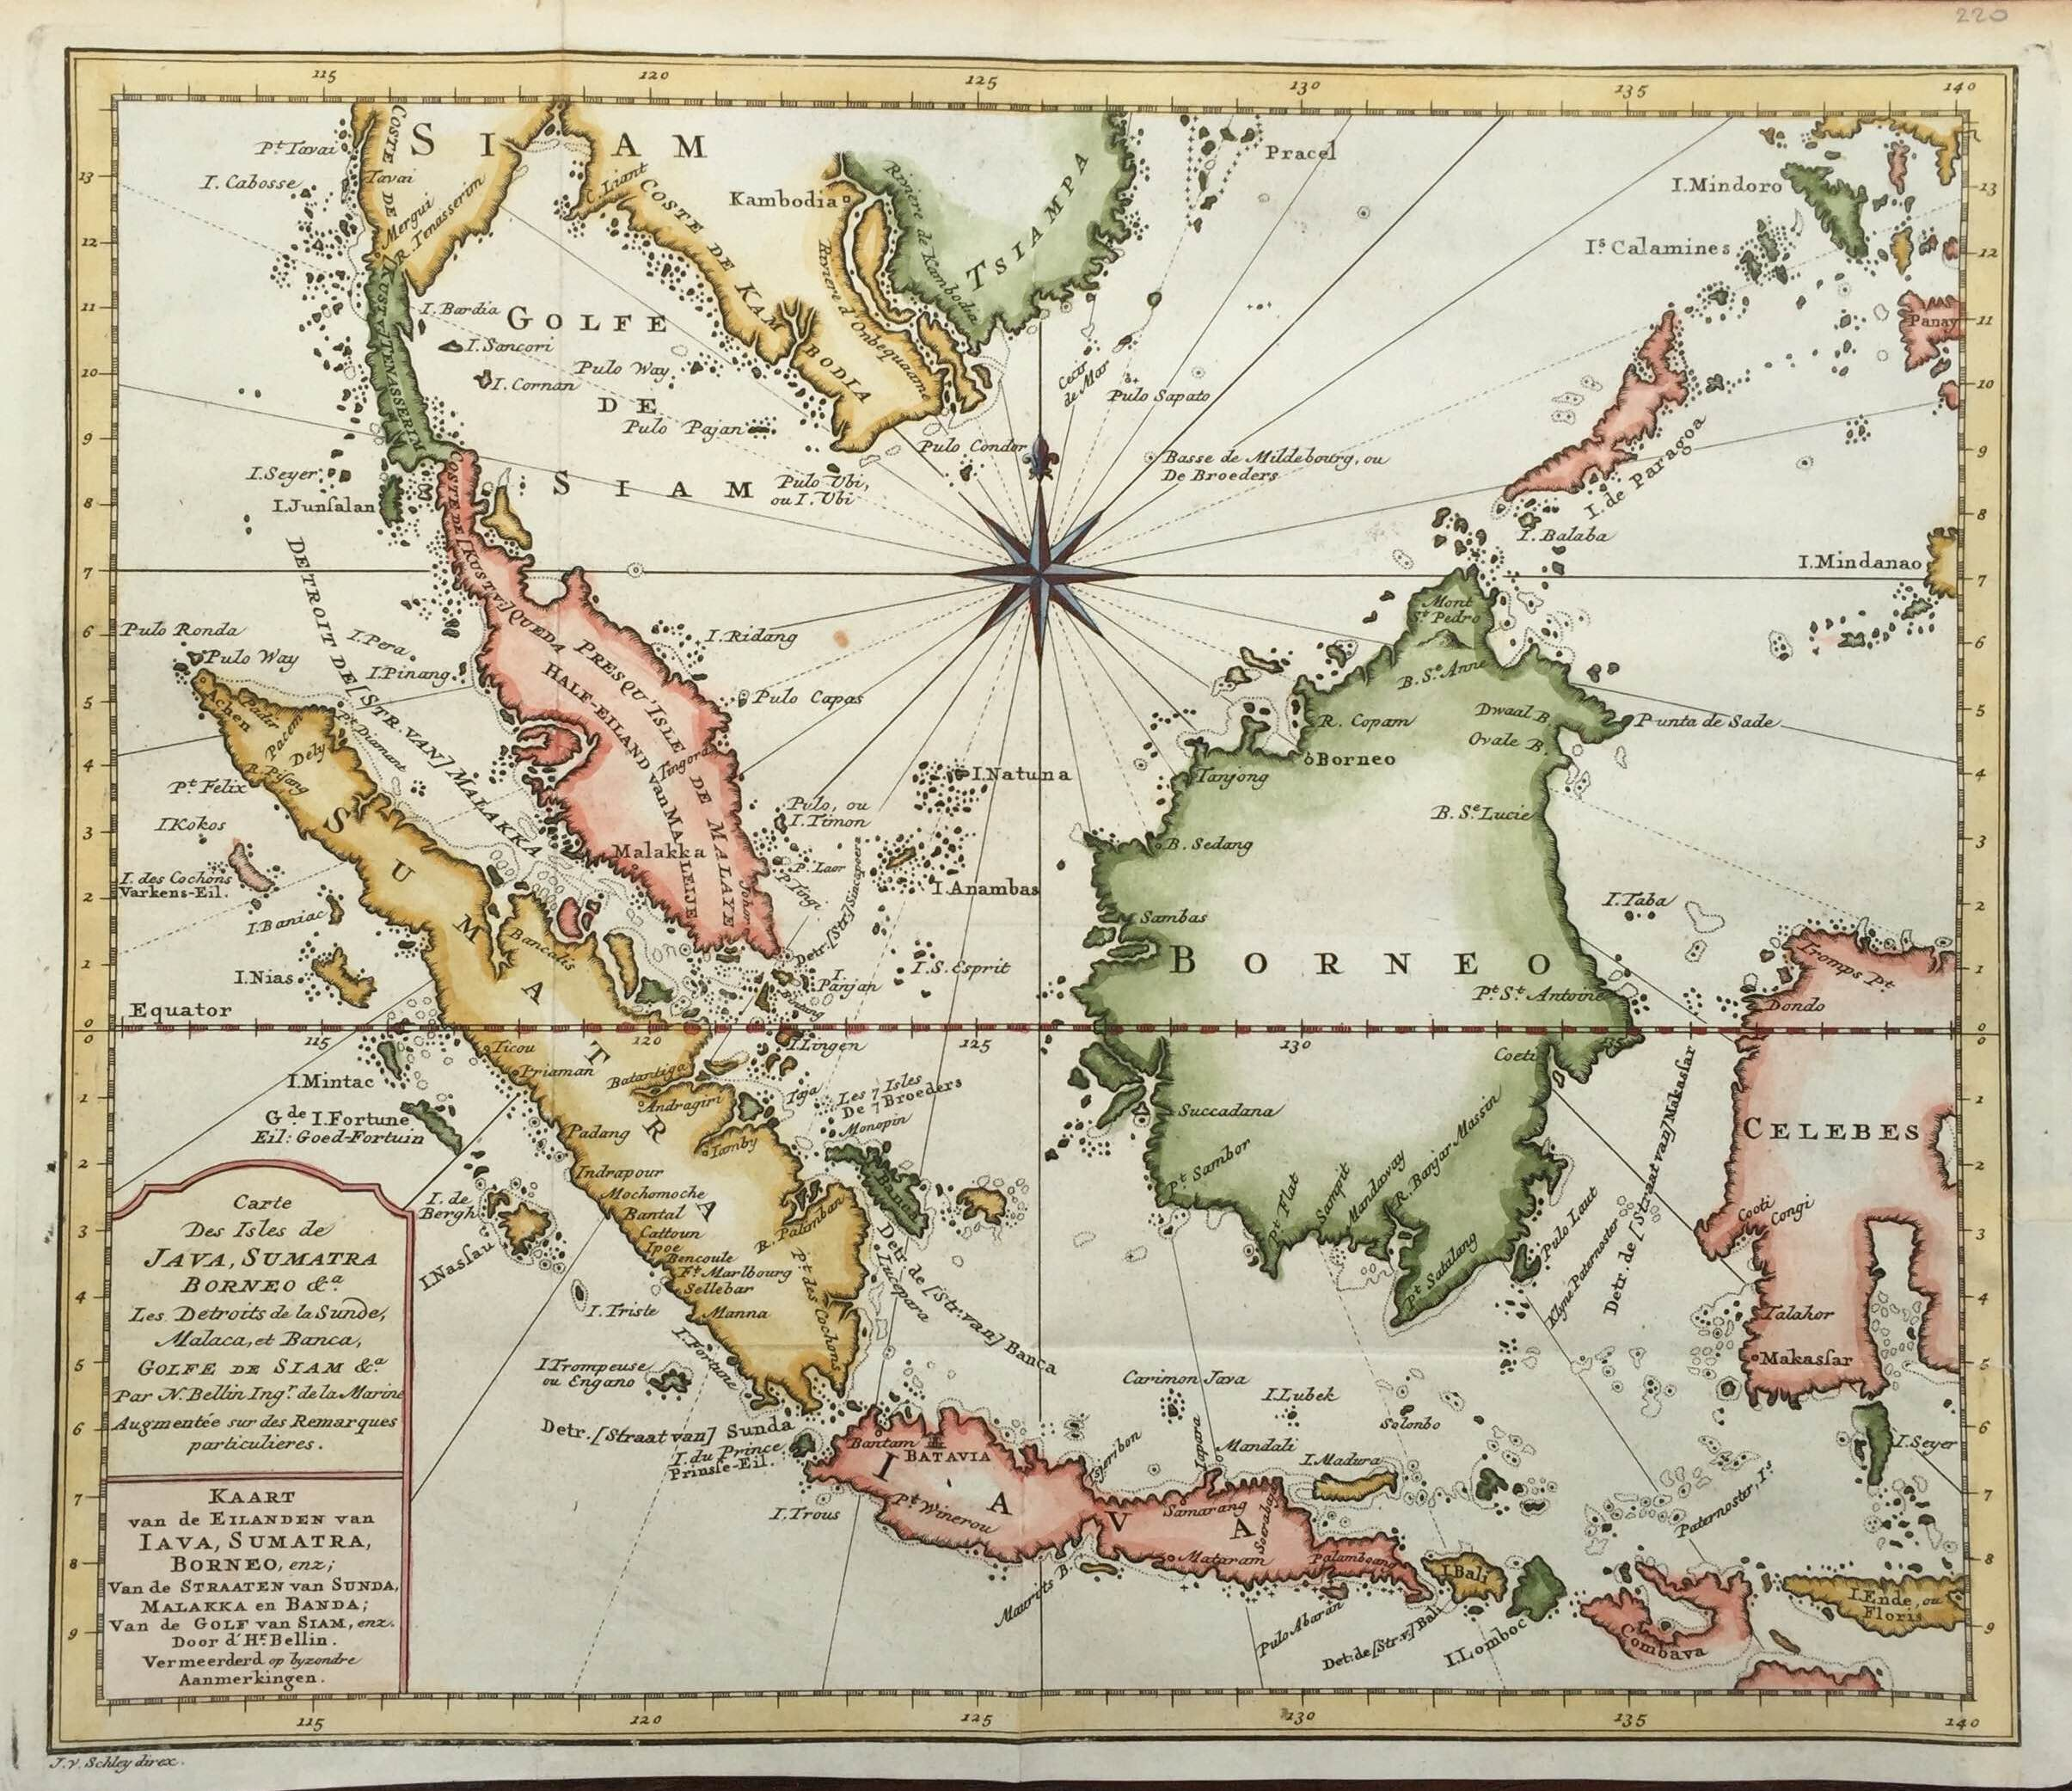 Carte Bali Sumatra.Antique Map Of Java Sumatra And Borneo By Bellin 1773